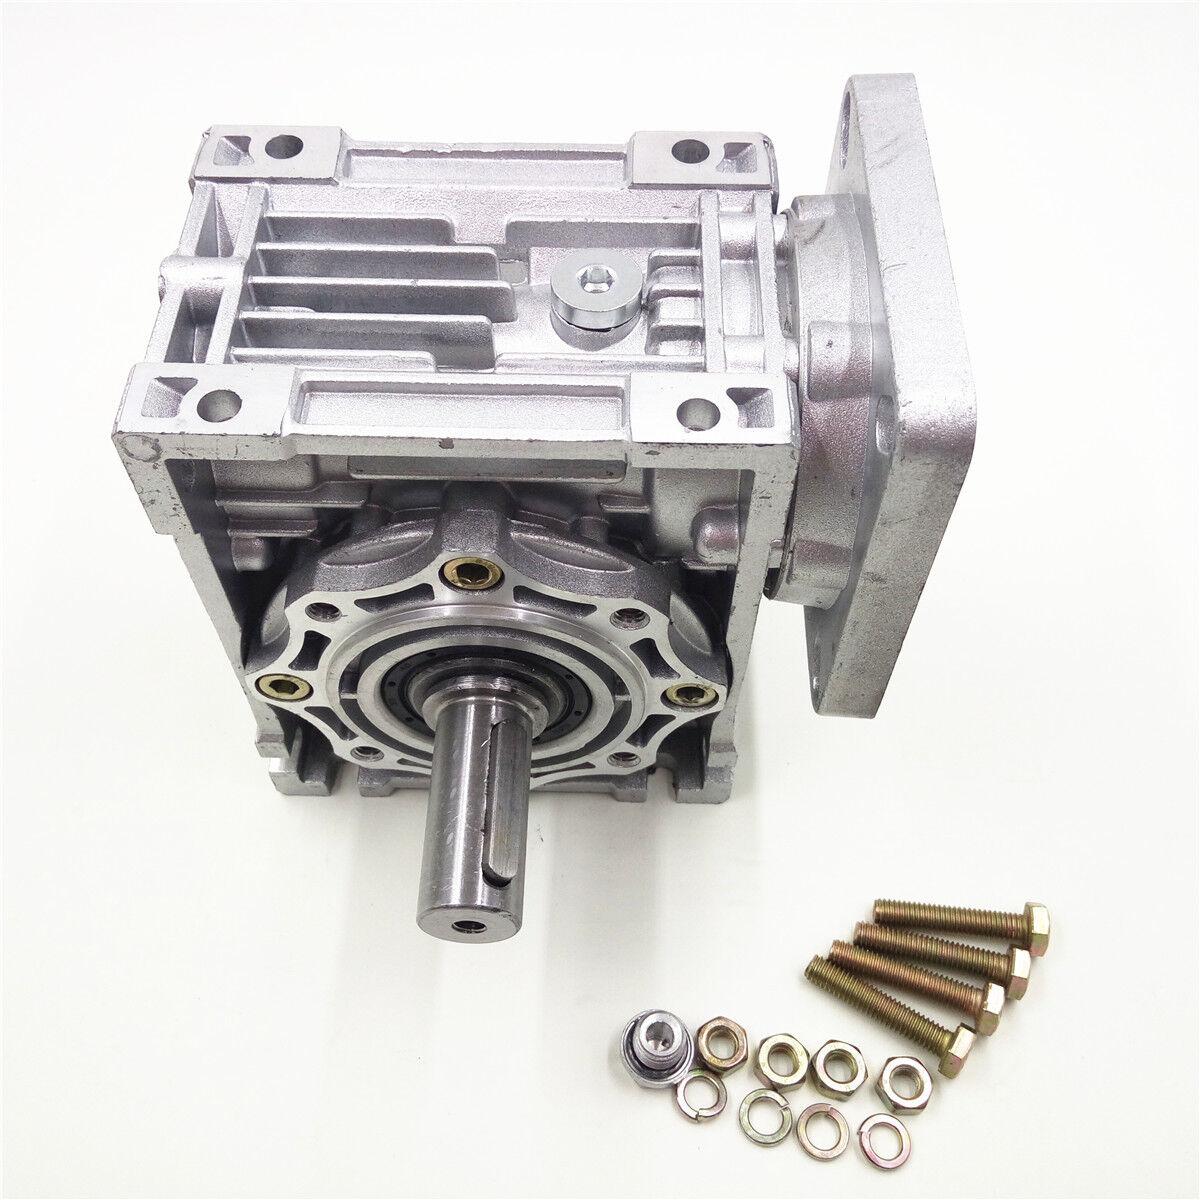 Nema34 Worm Gearbox Geared Speed Reducer 14mm Input Reduction for Stepper Motor 2